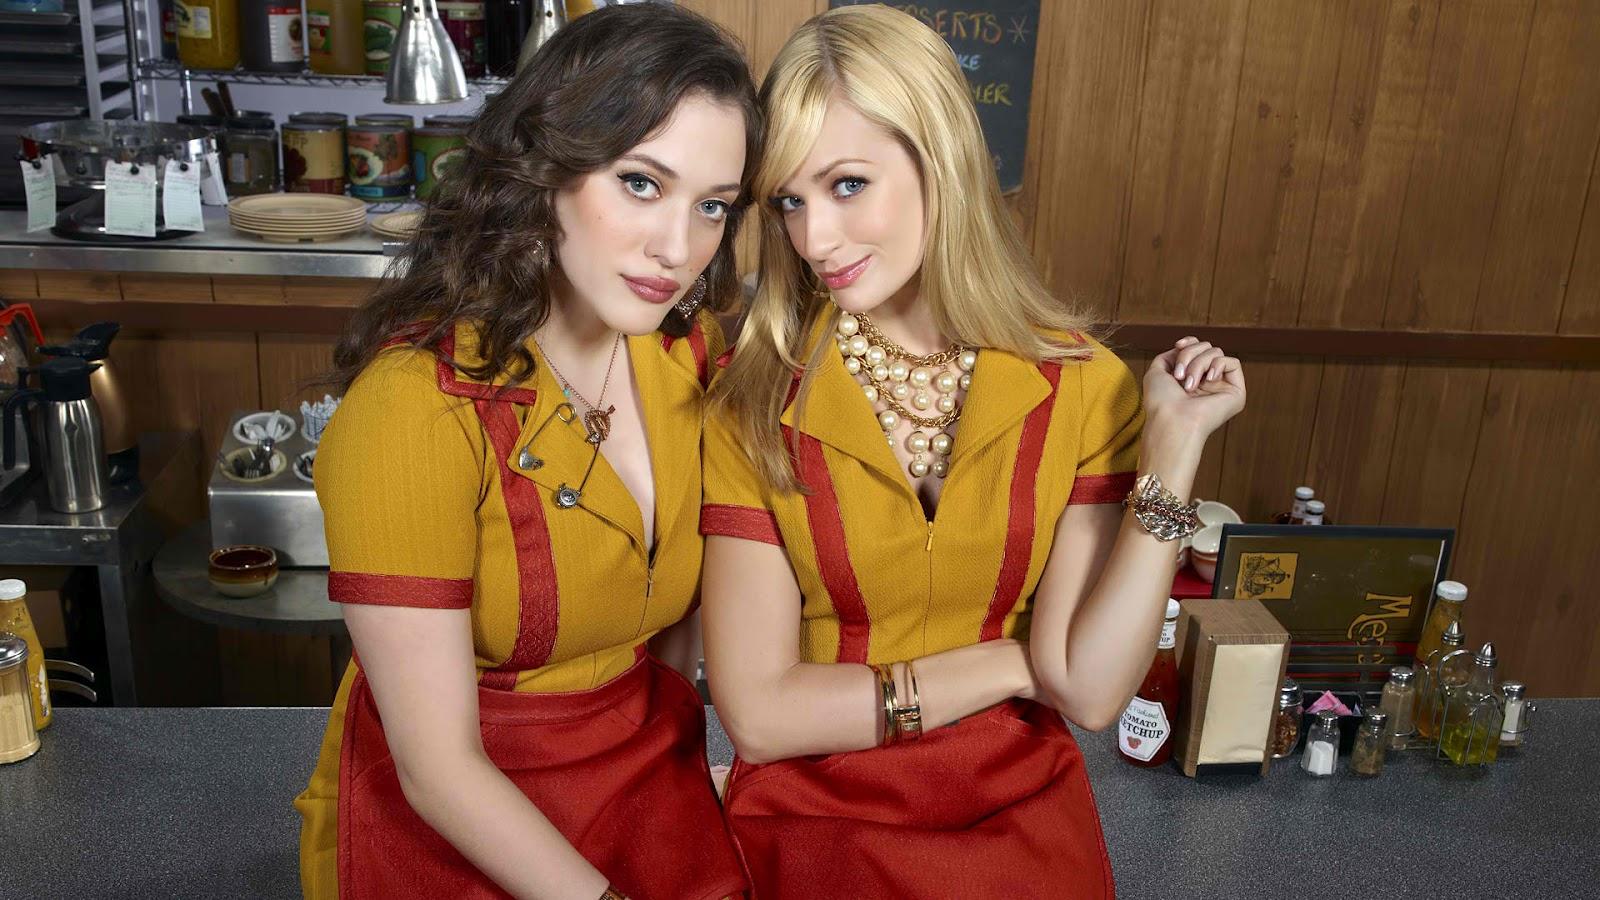 2 broke girls ende